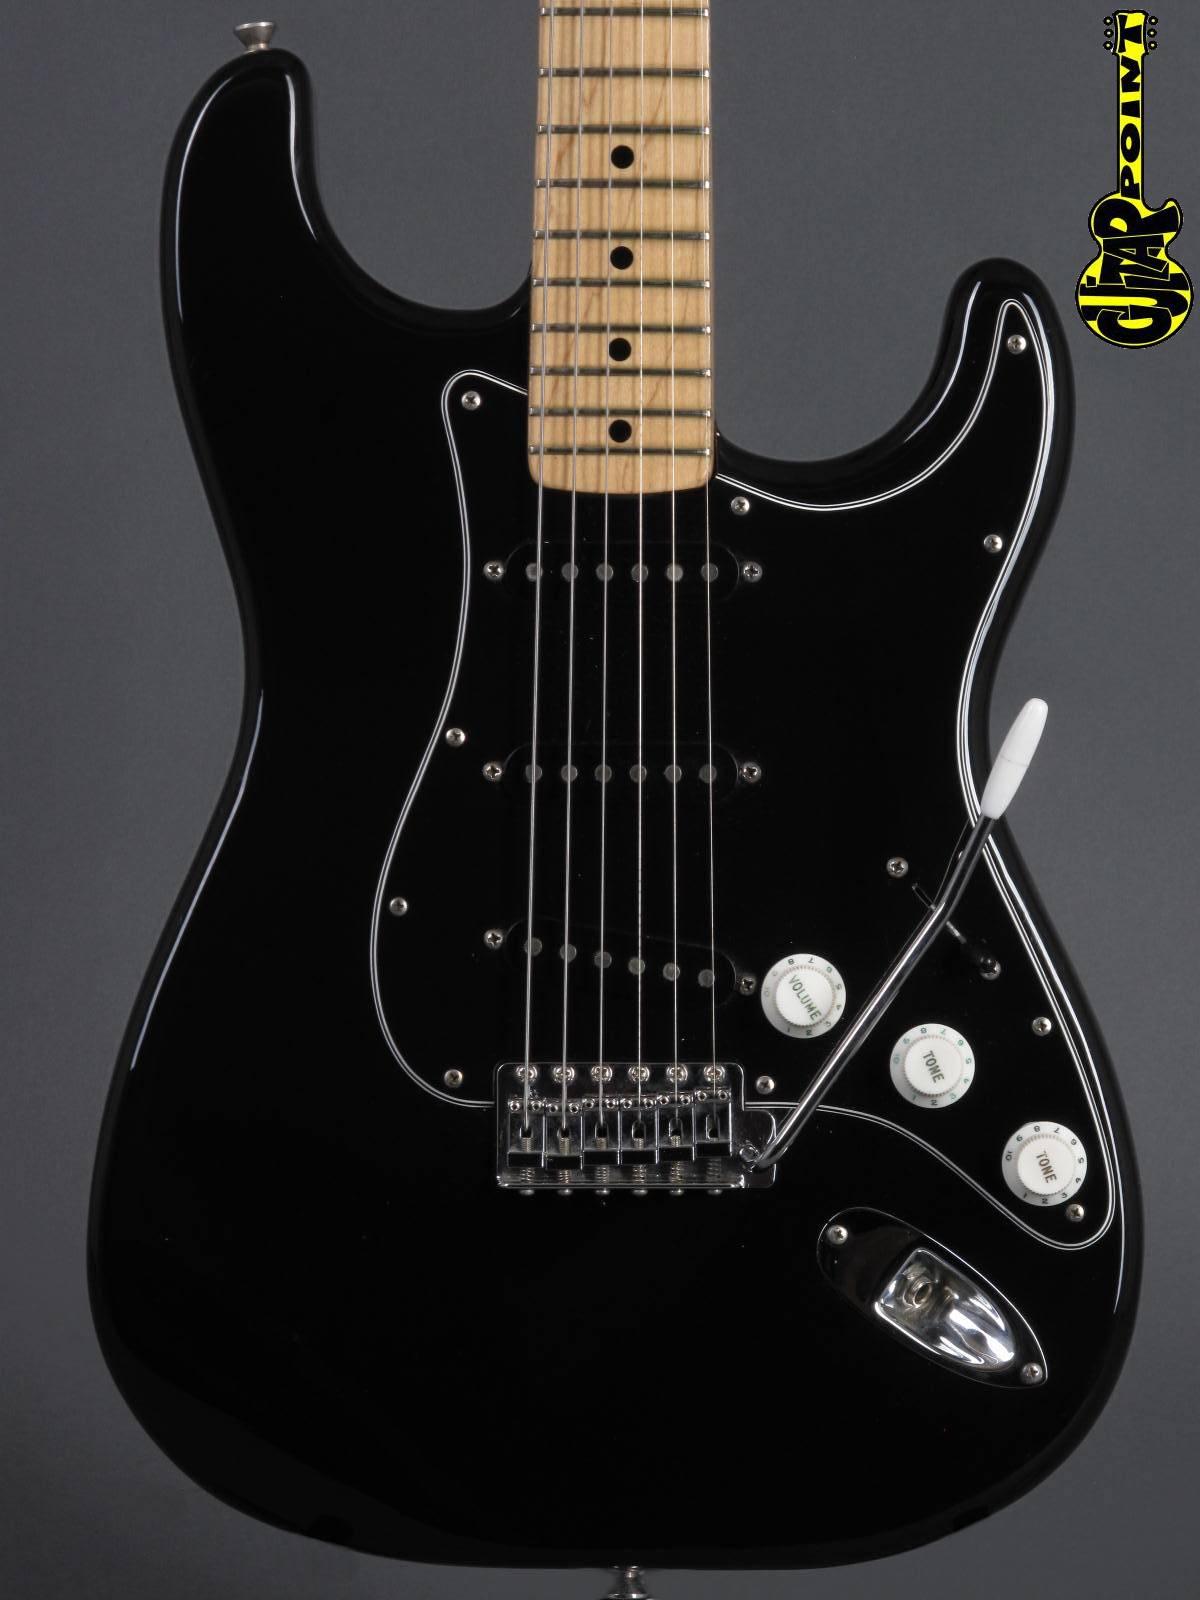 1976 Fender Stratocaster - Black / Mapleneck incl. orig. Fender Tolex case